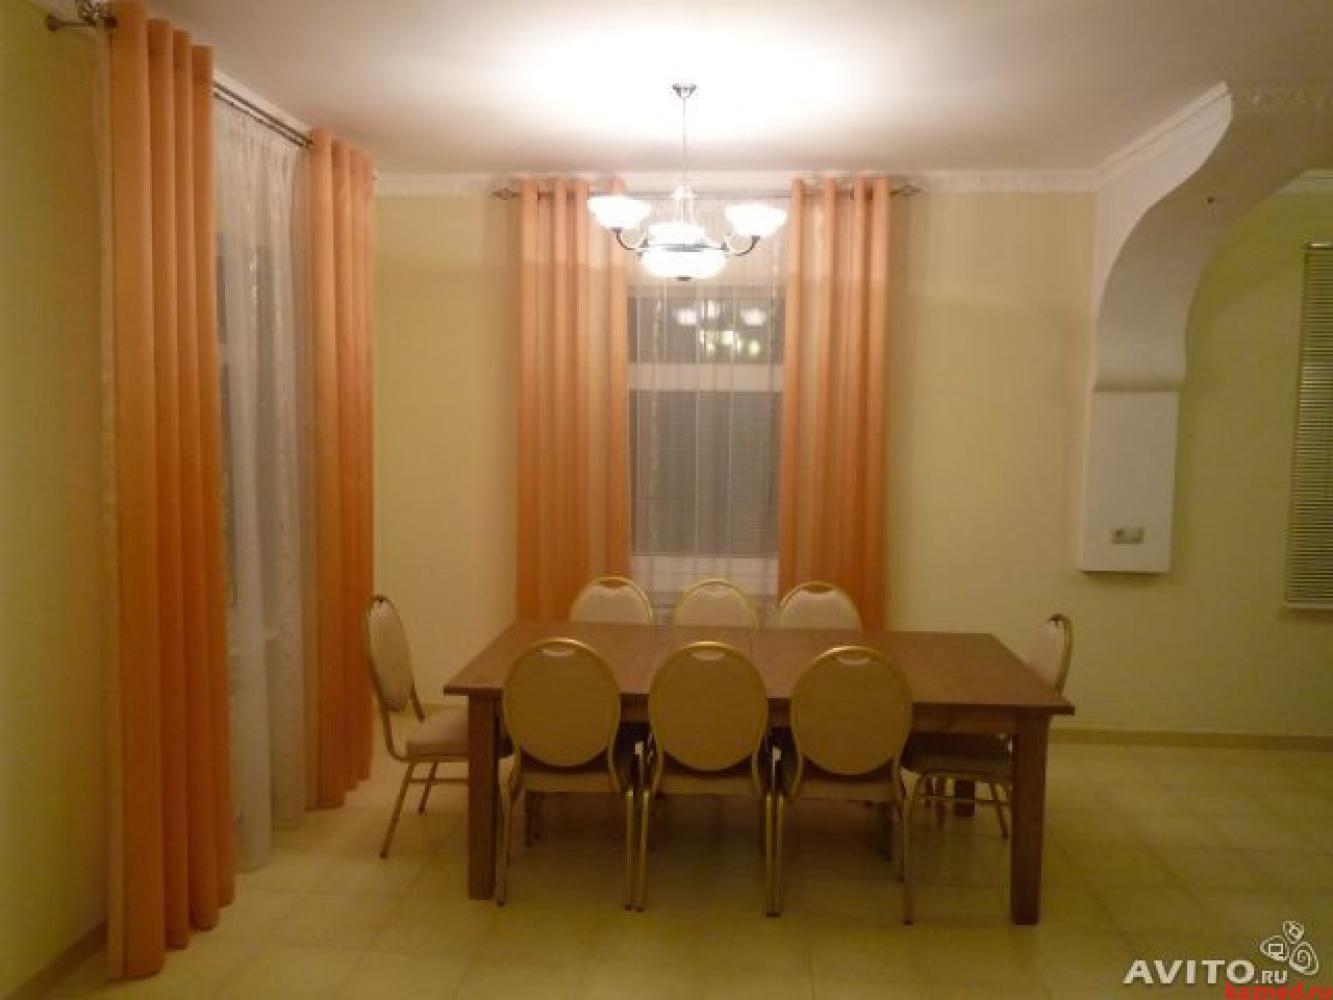 Продажа дом ул.Дорожная, 250 м2  (миниатюра №3)